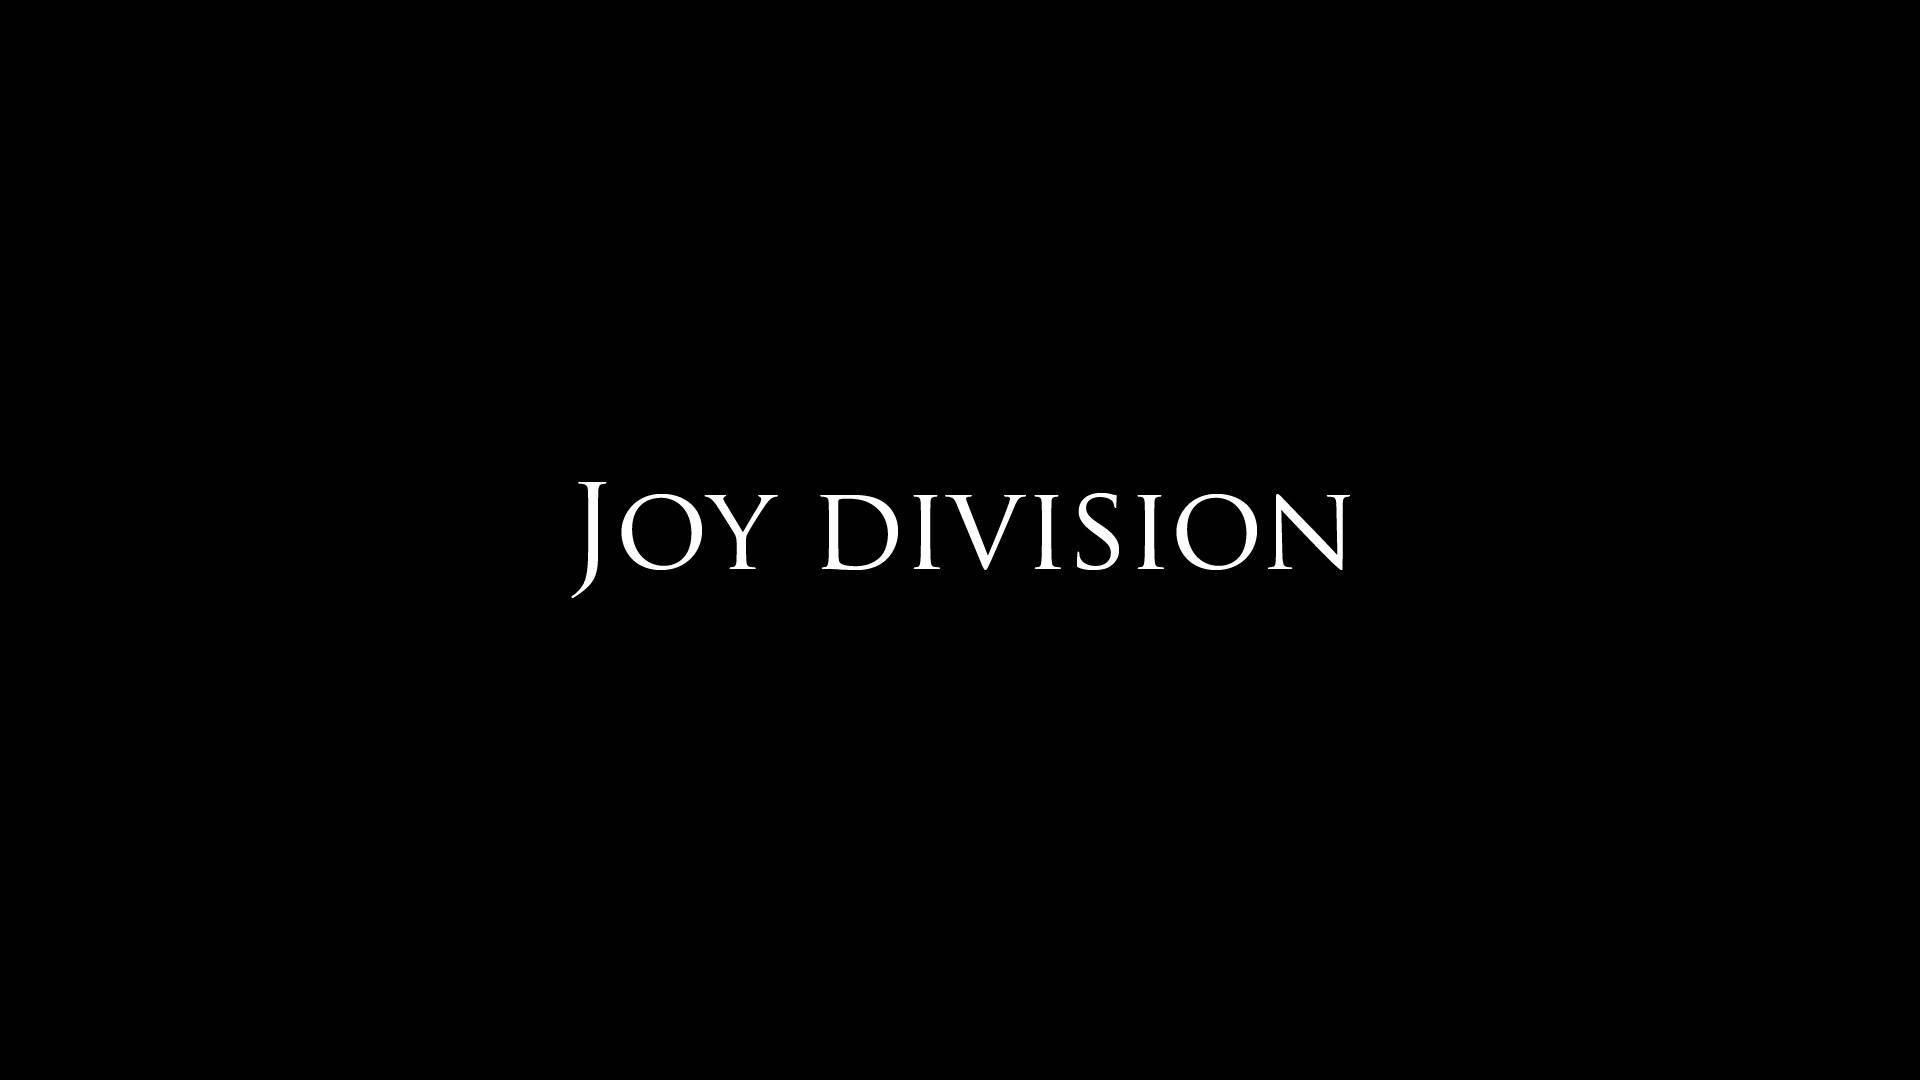 Joy Division HD pictures